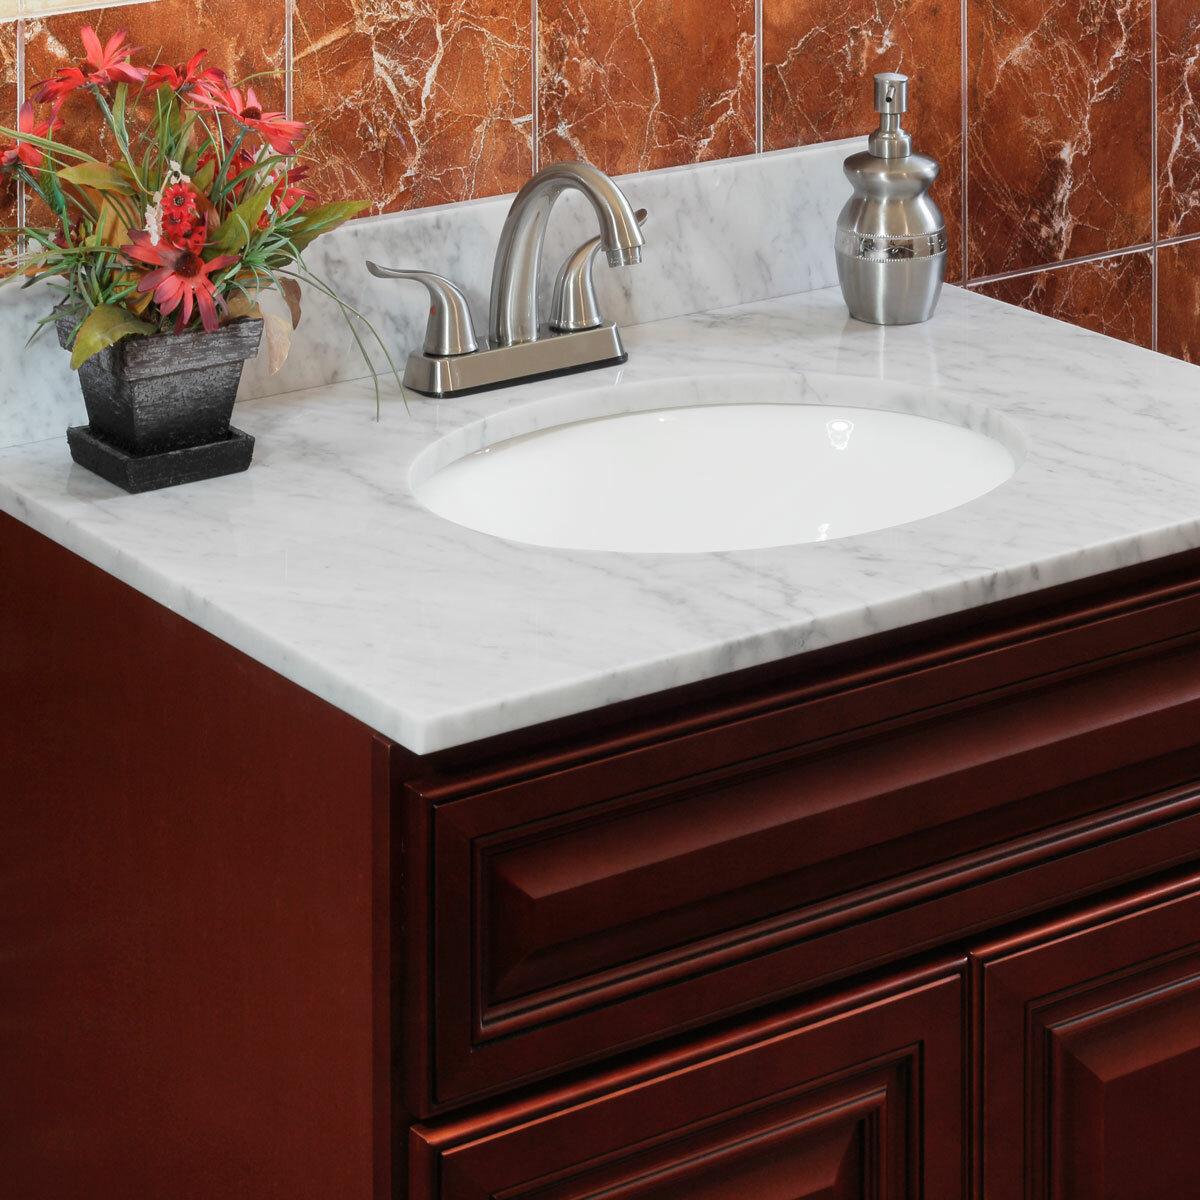 Cara White 61 Double Bathroom Vanity Top